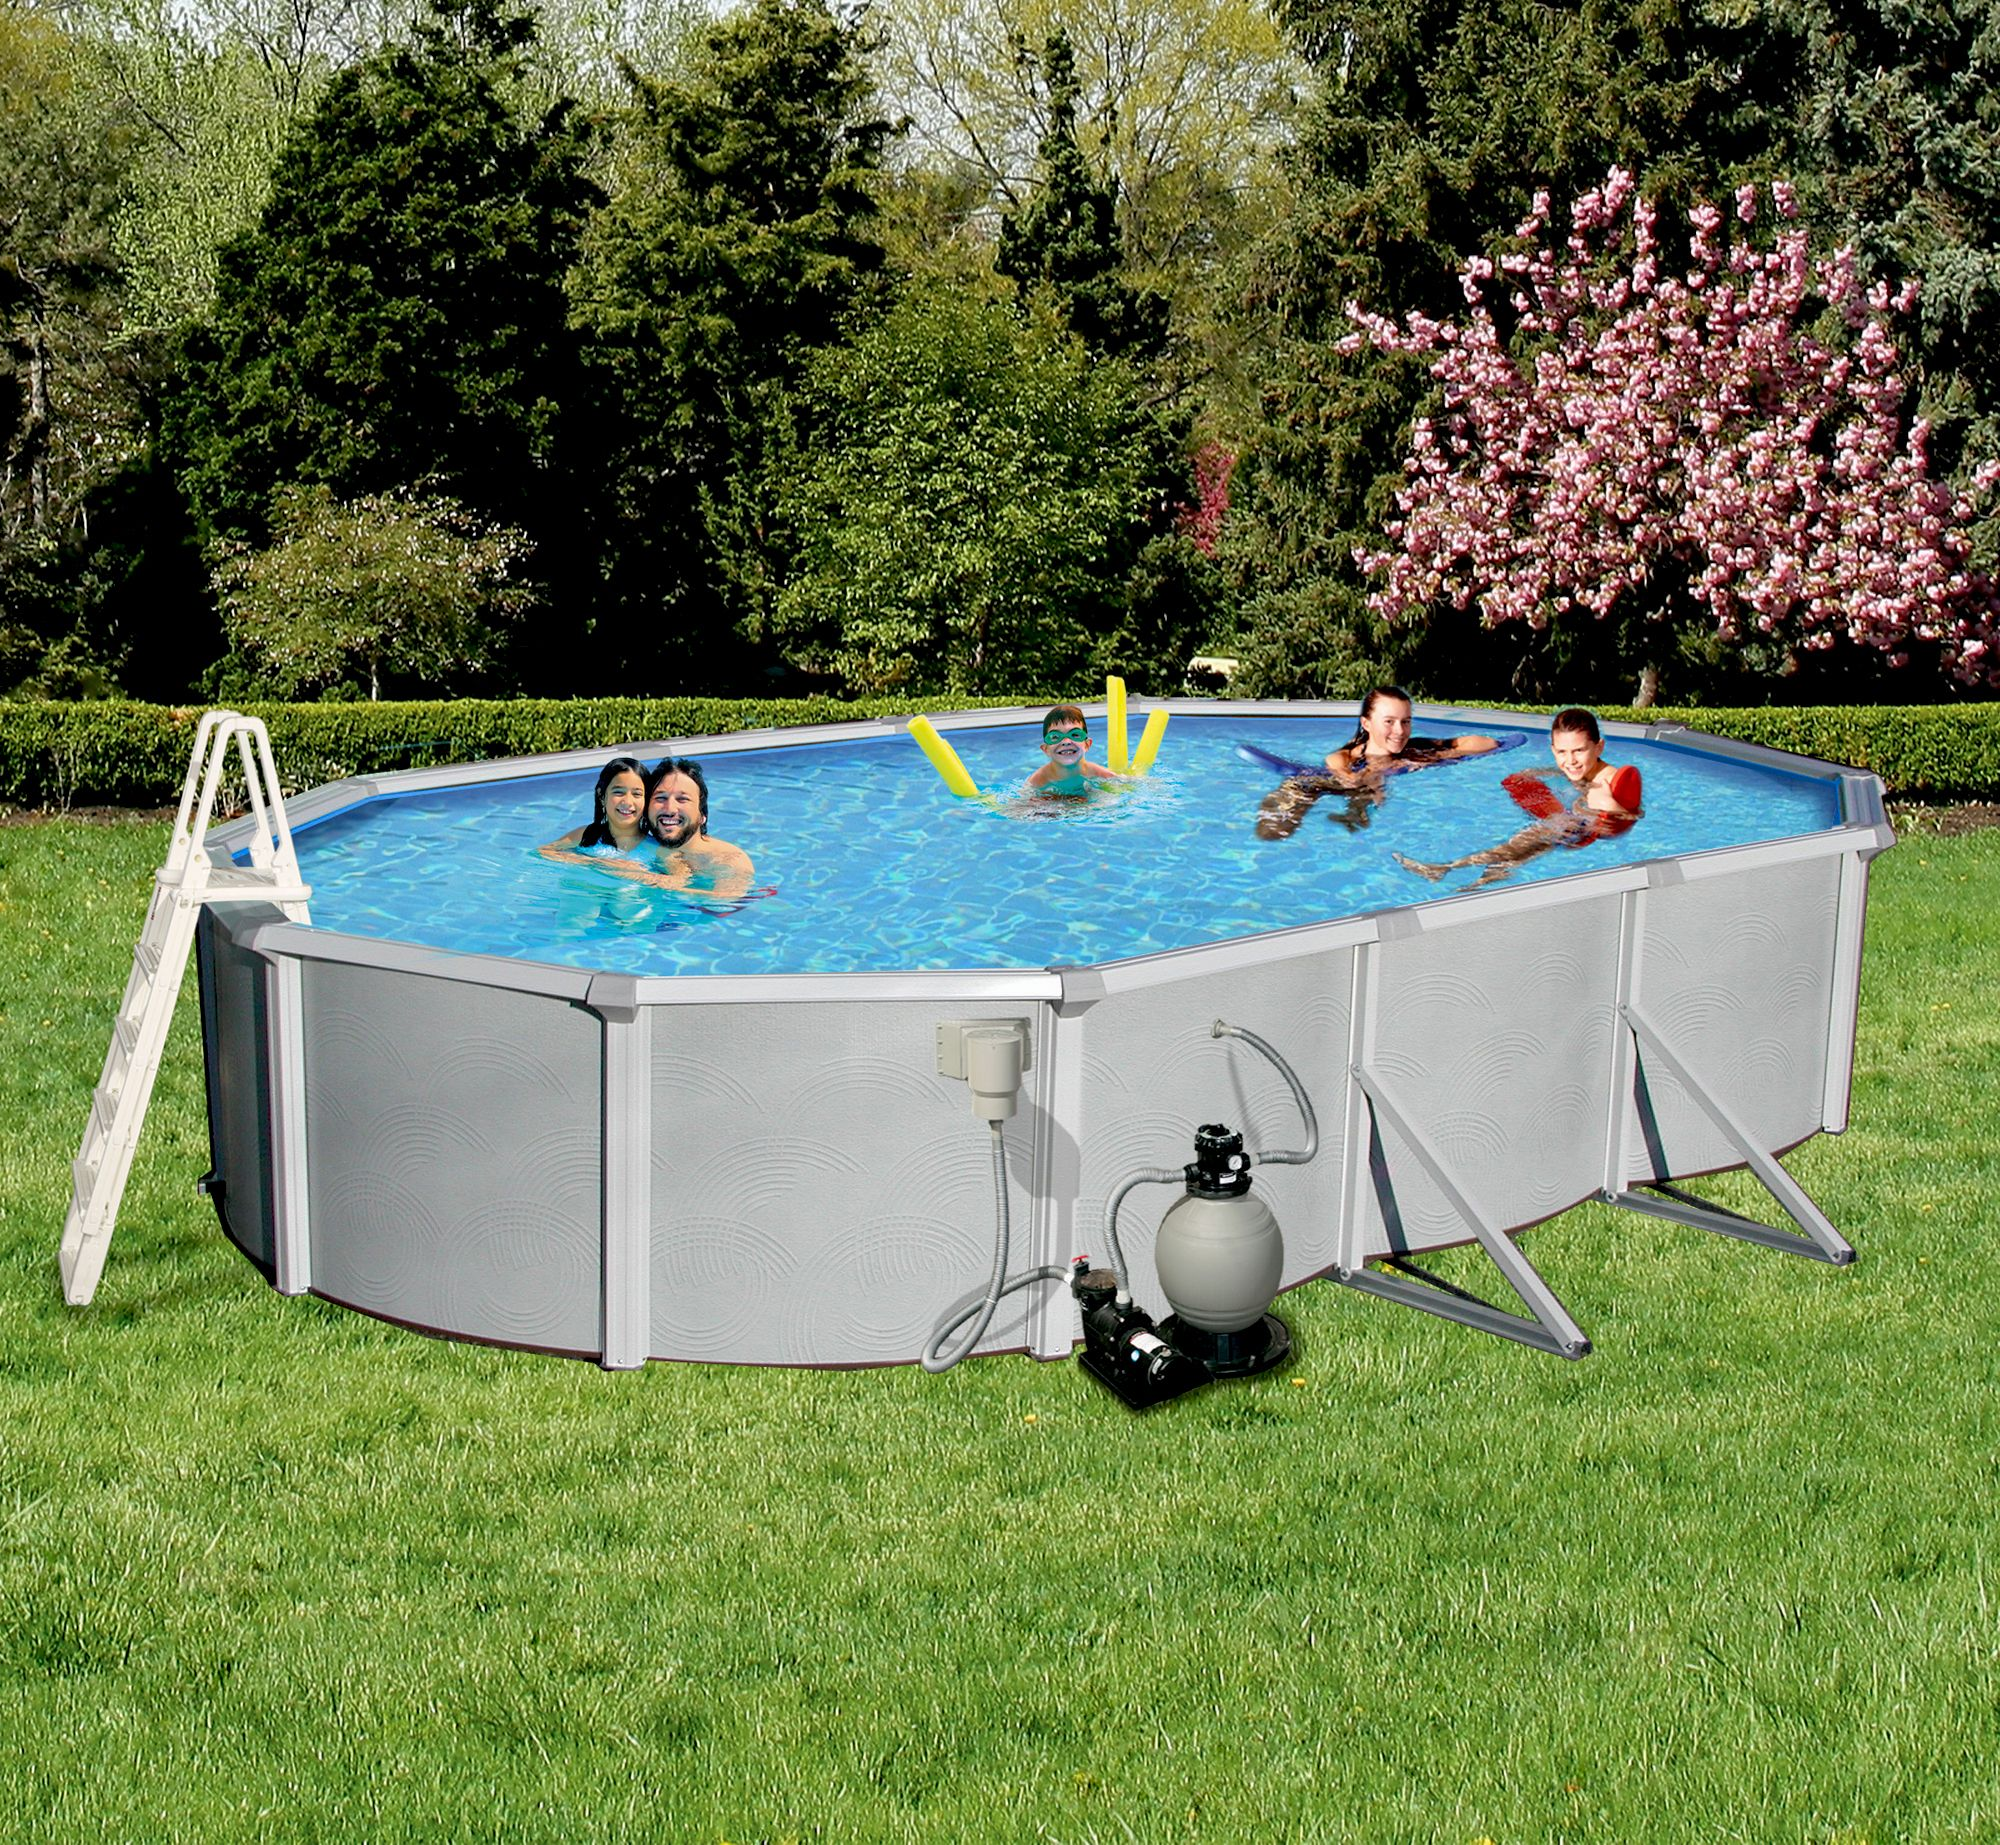 15 12 ft deep swimming pool decor23 for 15 ft garden pool